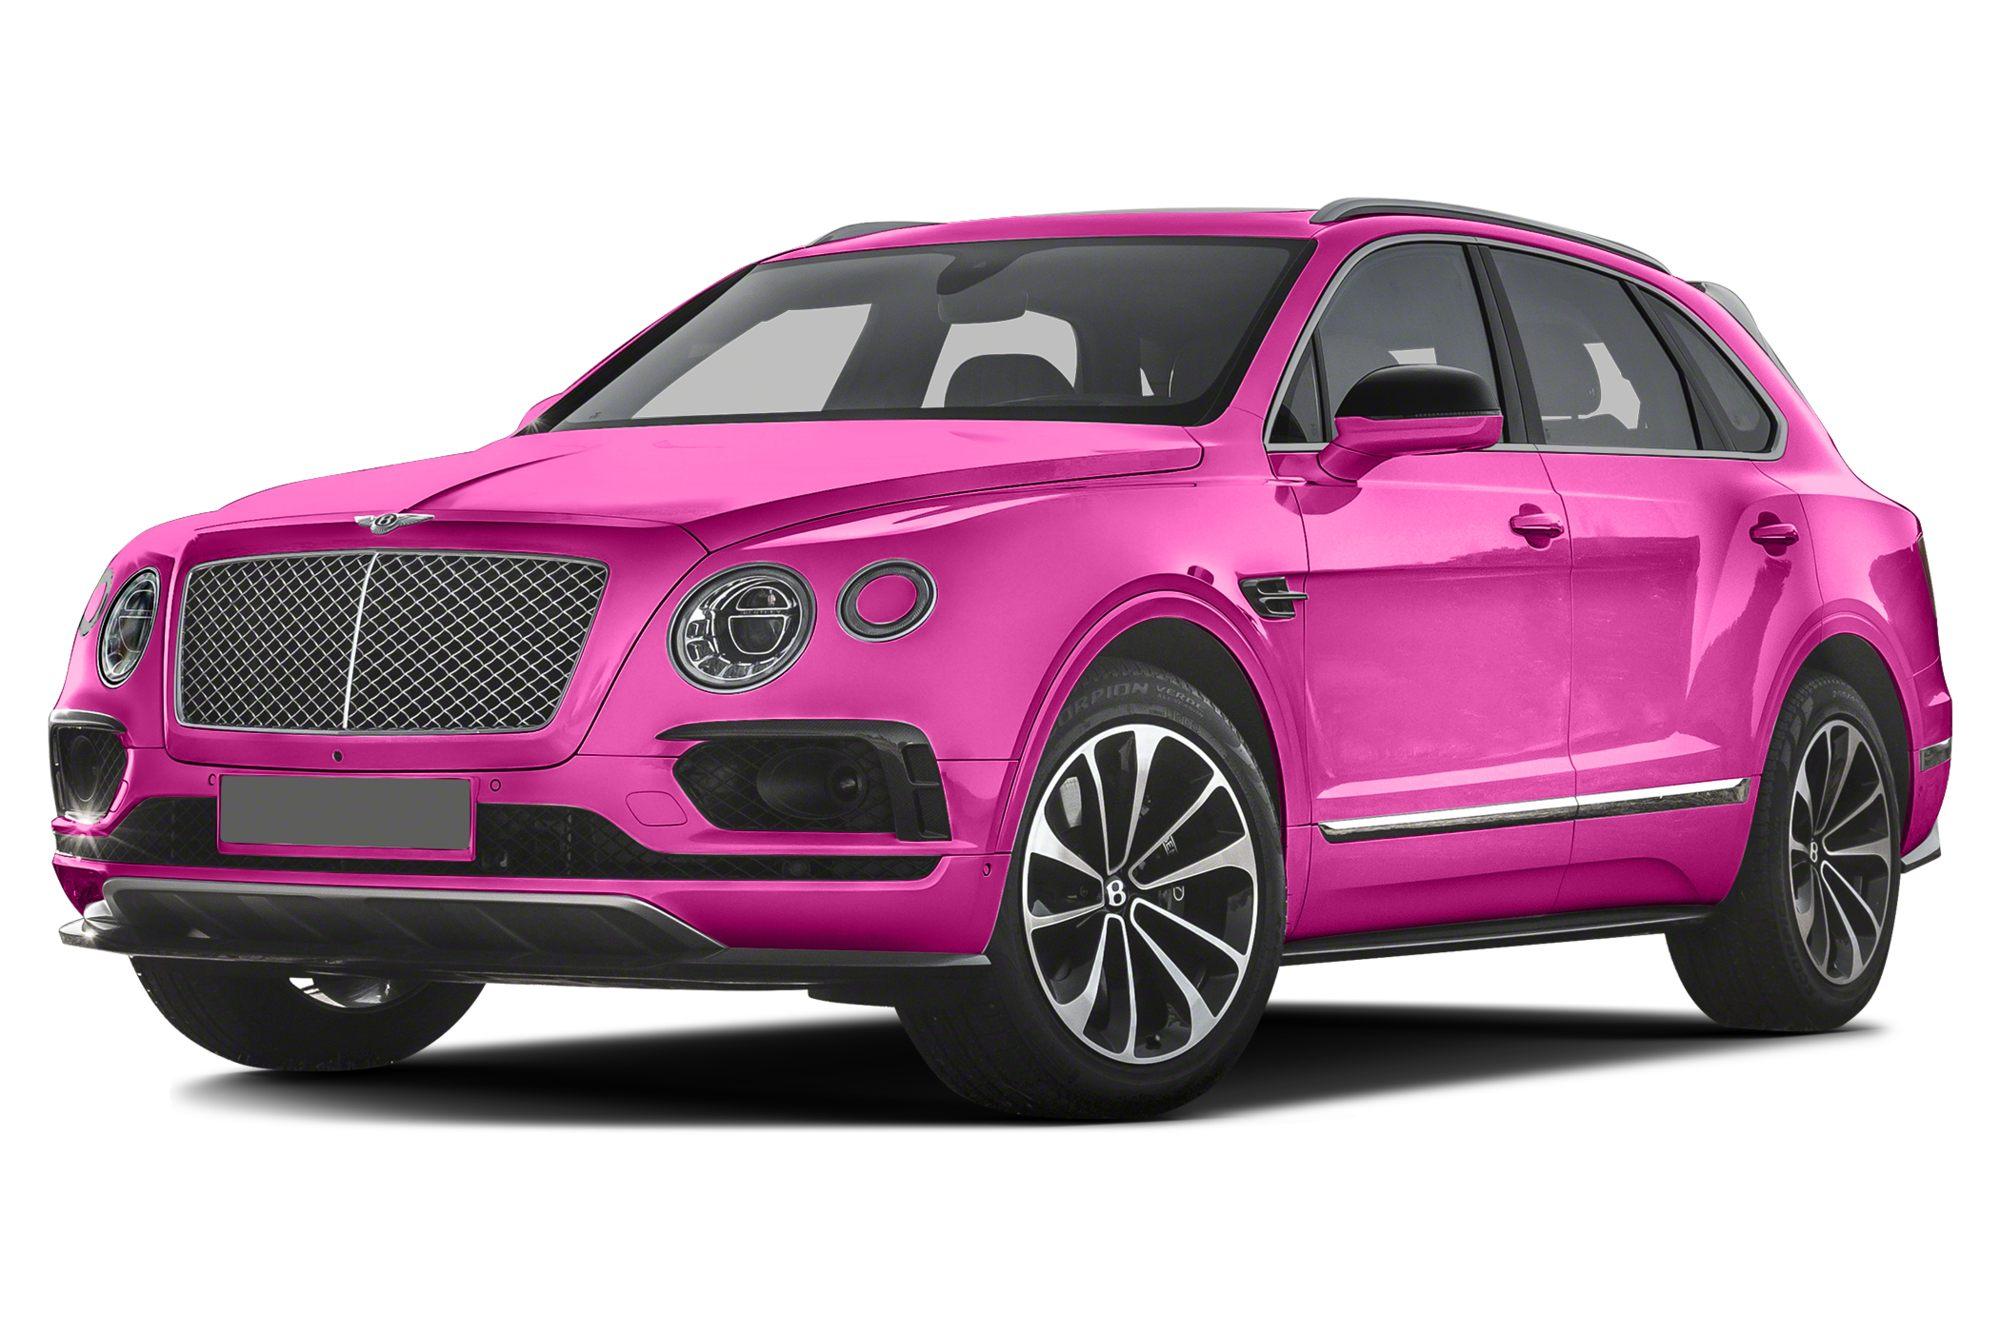 2018-2020 Bentley Bentayga: Recall Alert